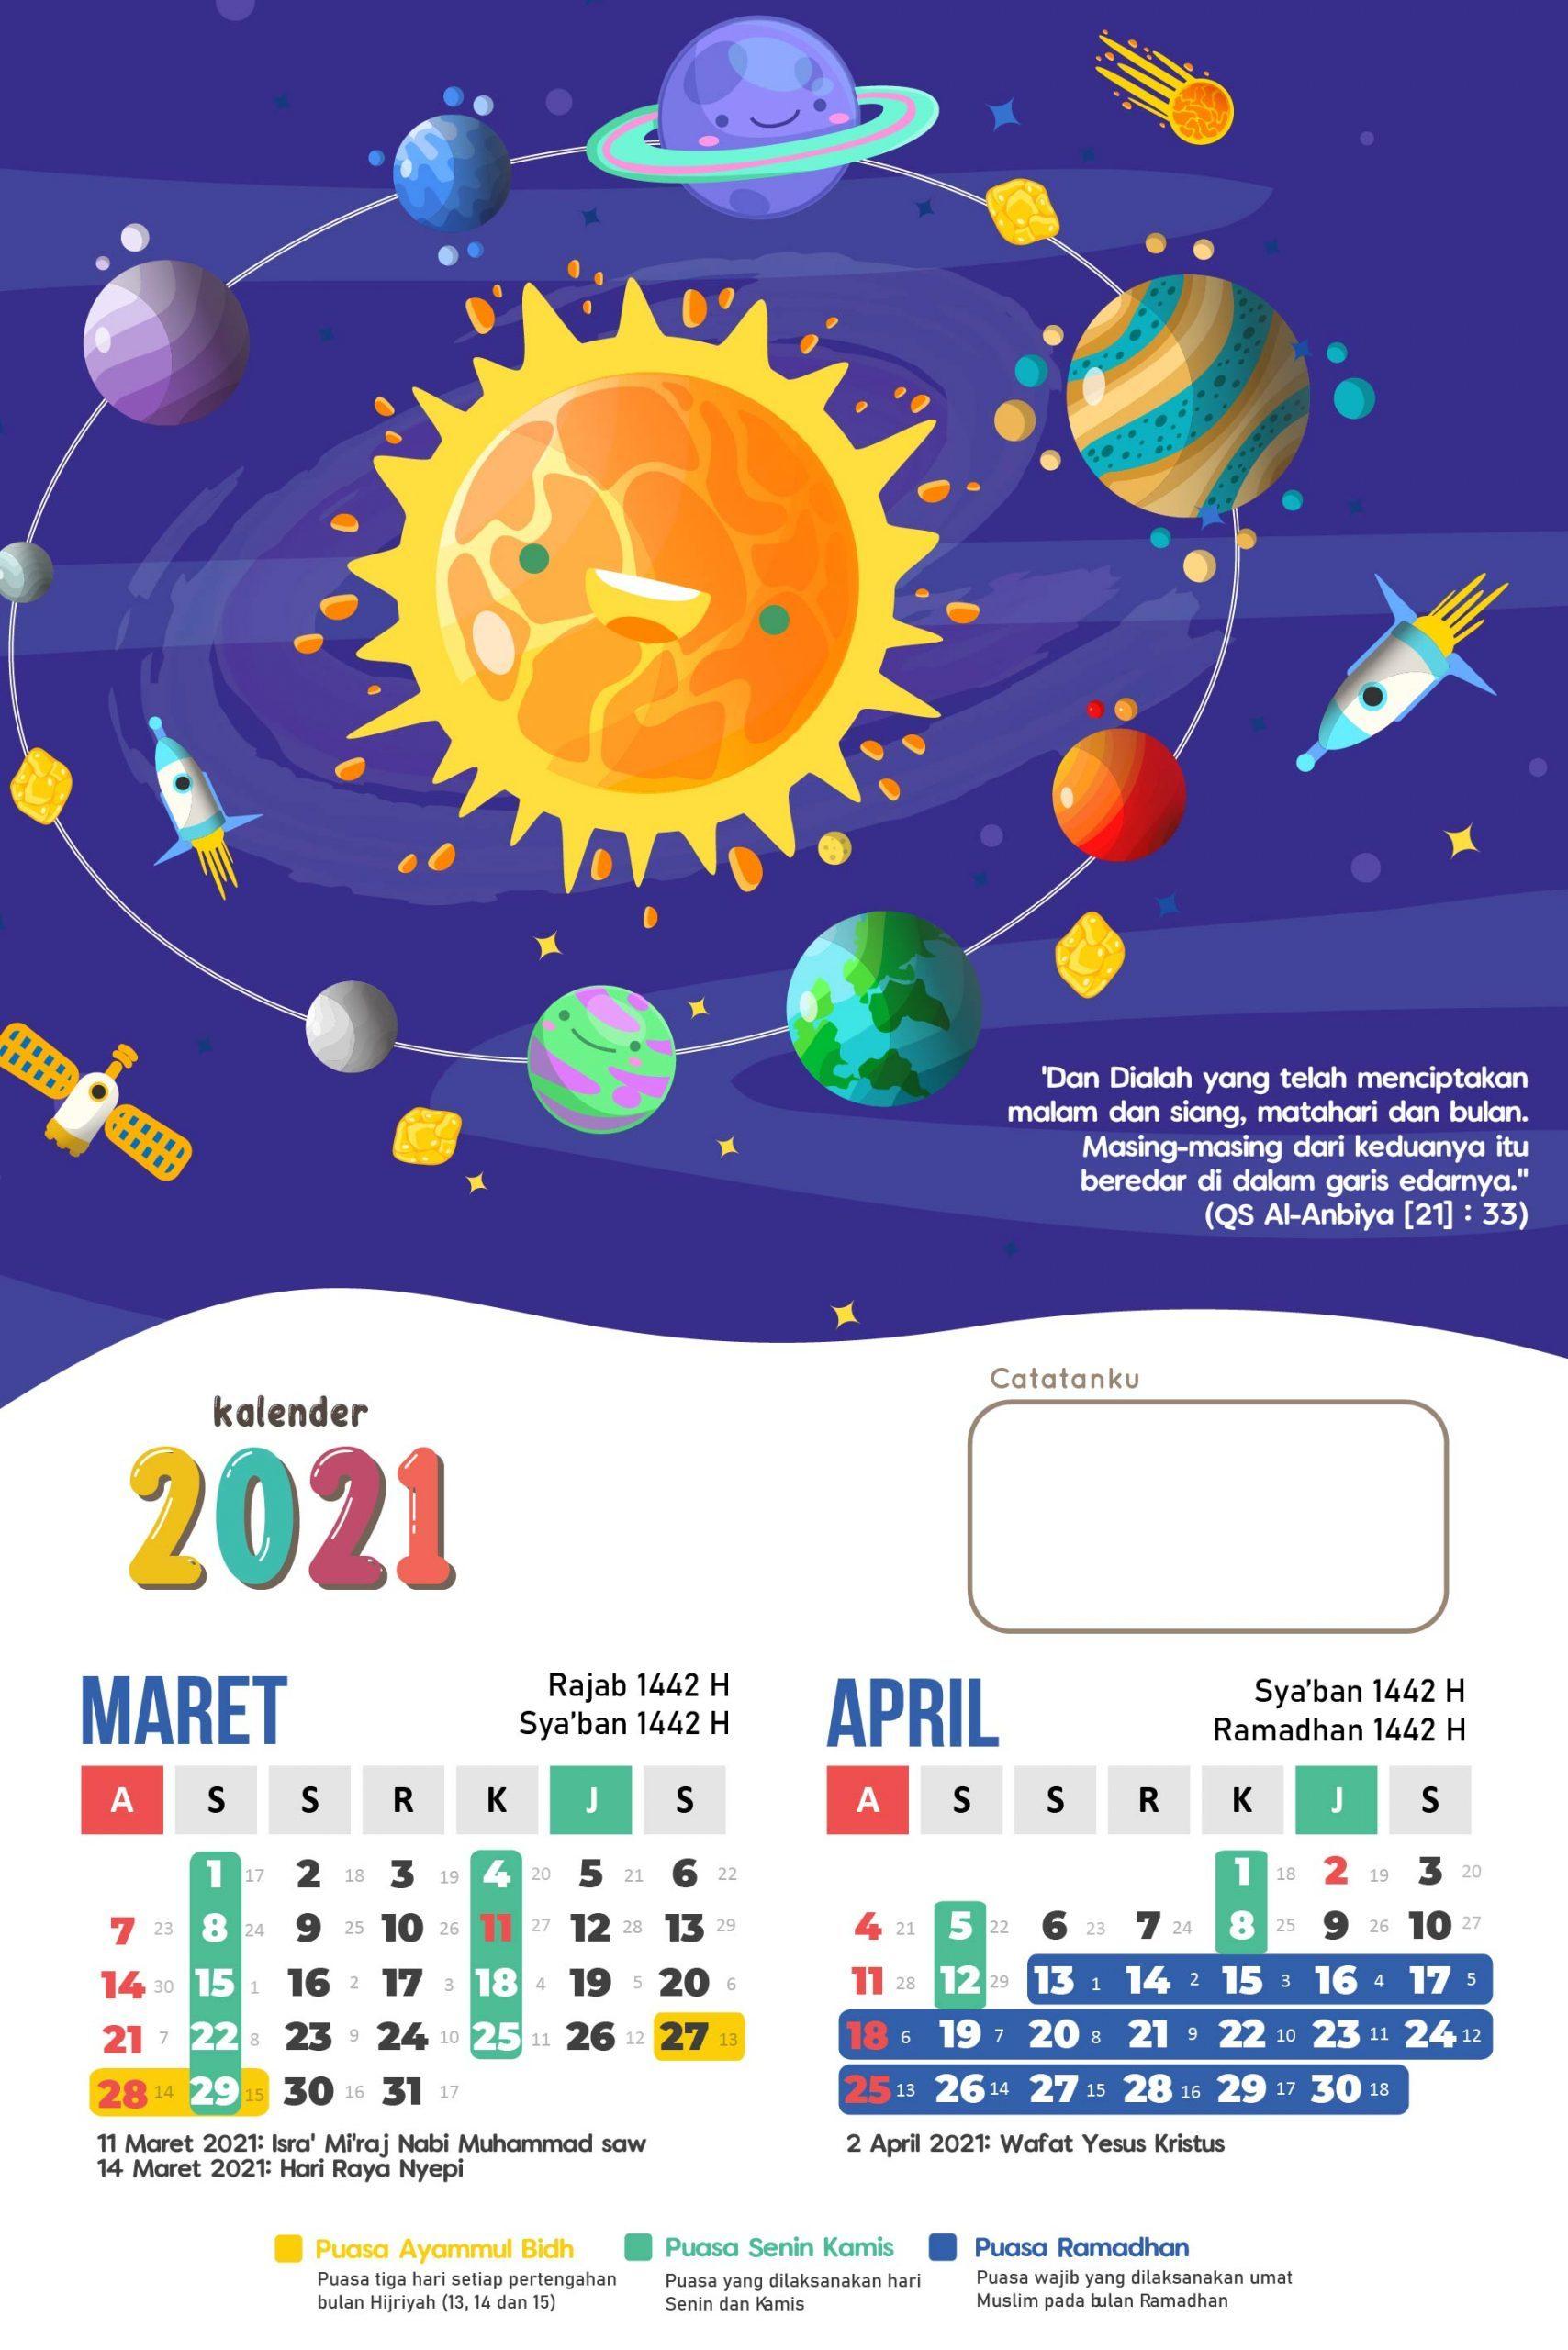 Kalenderblatt 2021 - Download Template Kalender 2021 Free ...